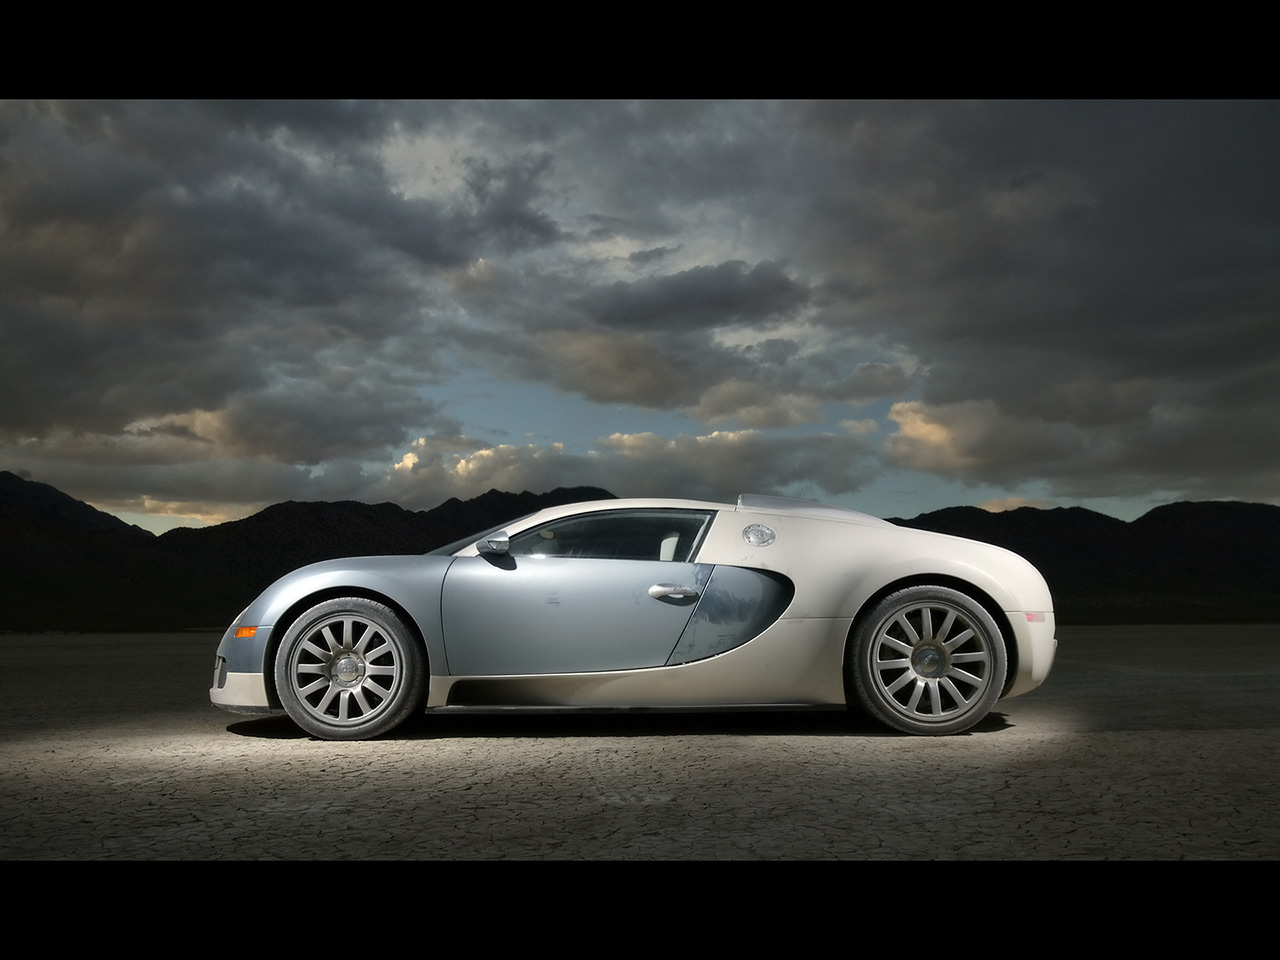 http://4.bp.blogspot.com/-a76Uyv923Js/TWfvo4u9TyI/AAAAAAAABVE/Ztnq9WtBwOs/s1600/2007-Bugatti-Veyron-Side.jpg